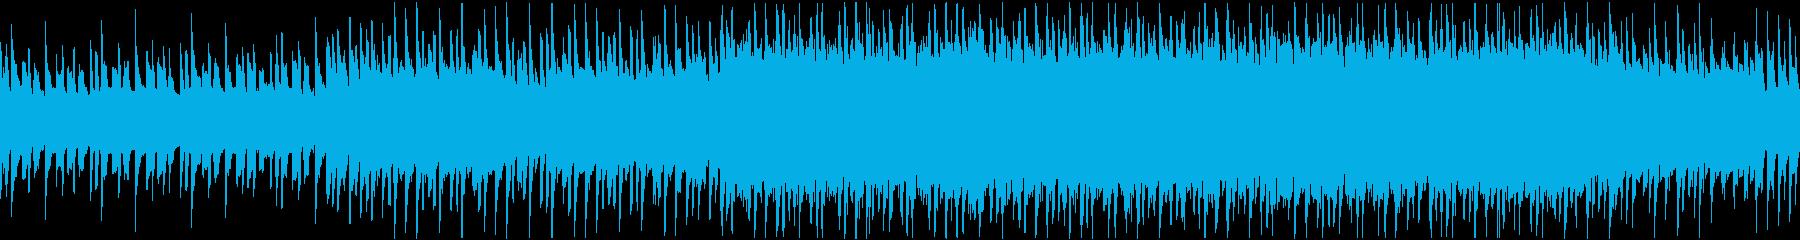 FM音源でアクションの再生済みの波形